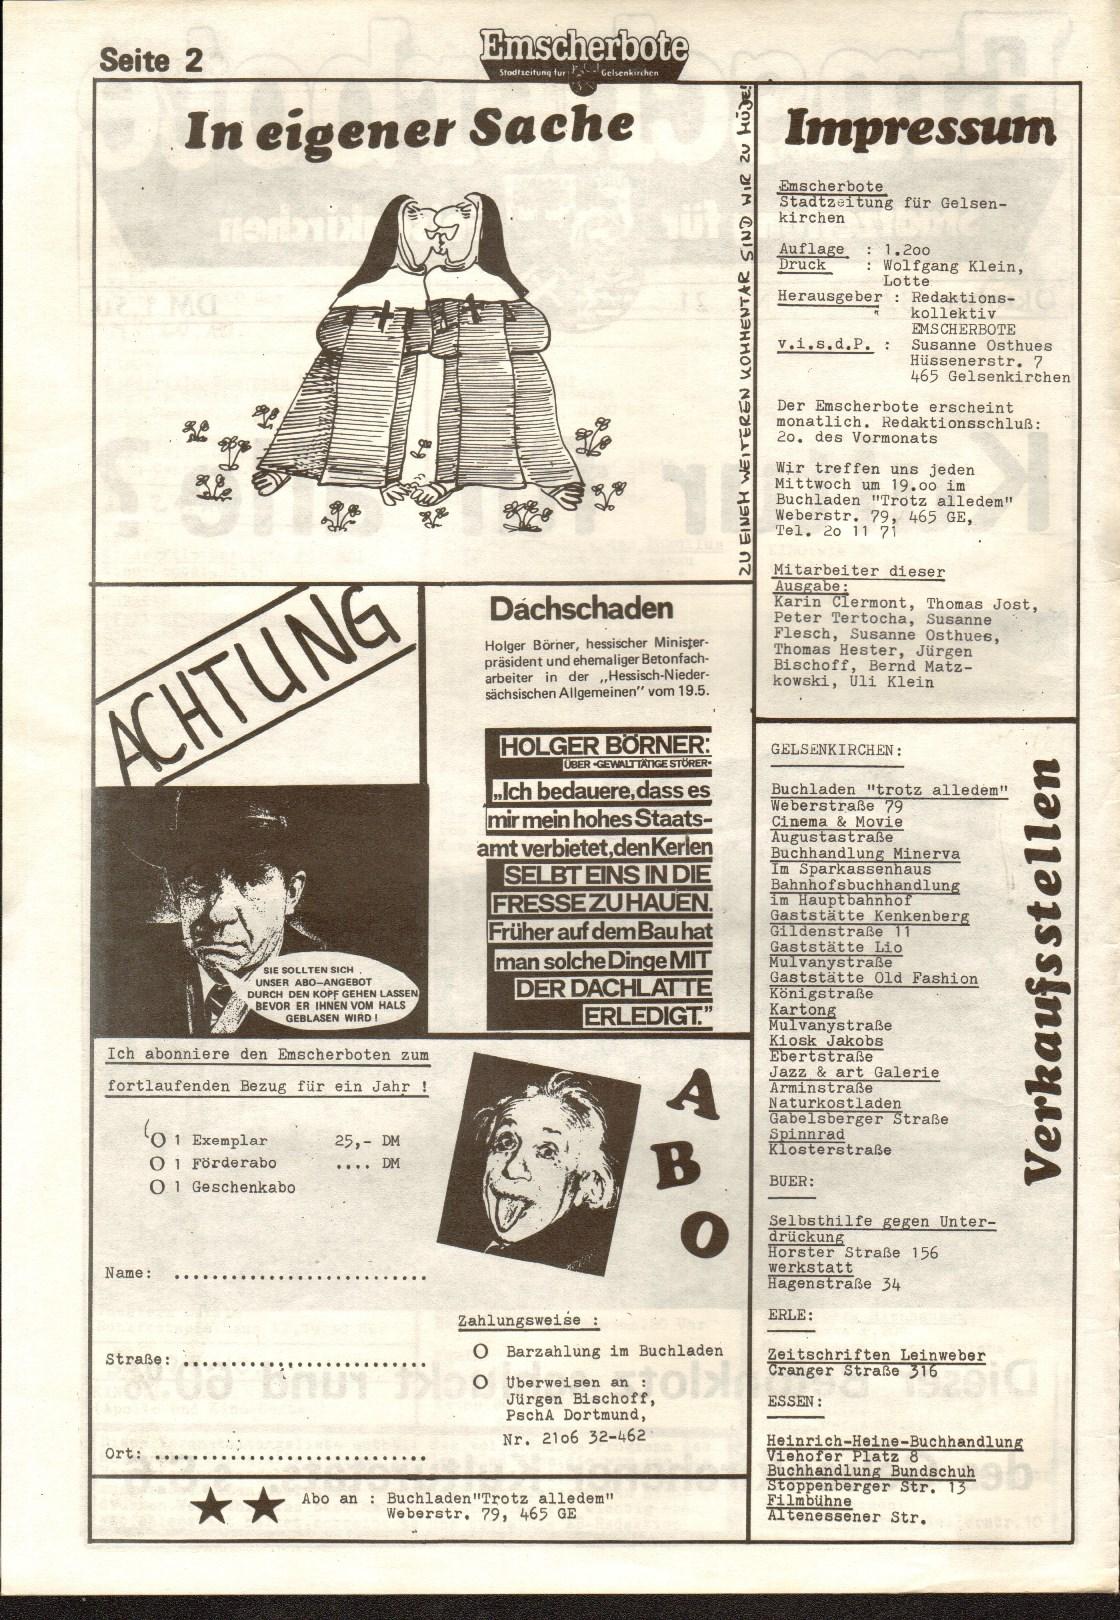 Gelsenkirchen_Emscherbote_1982_21_02